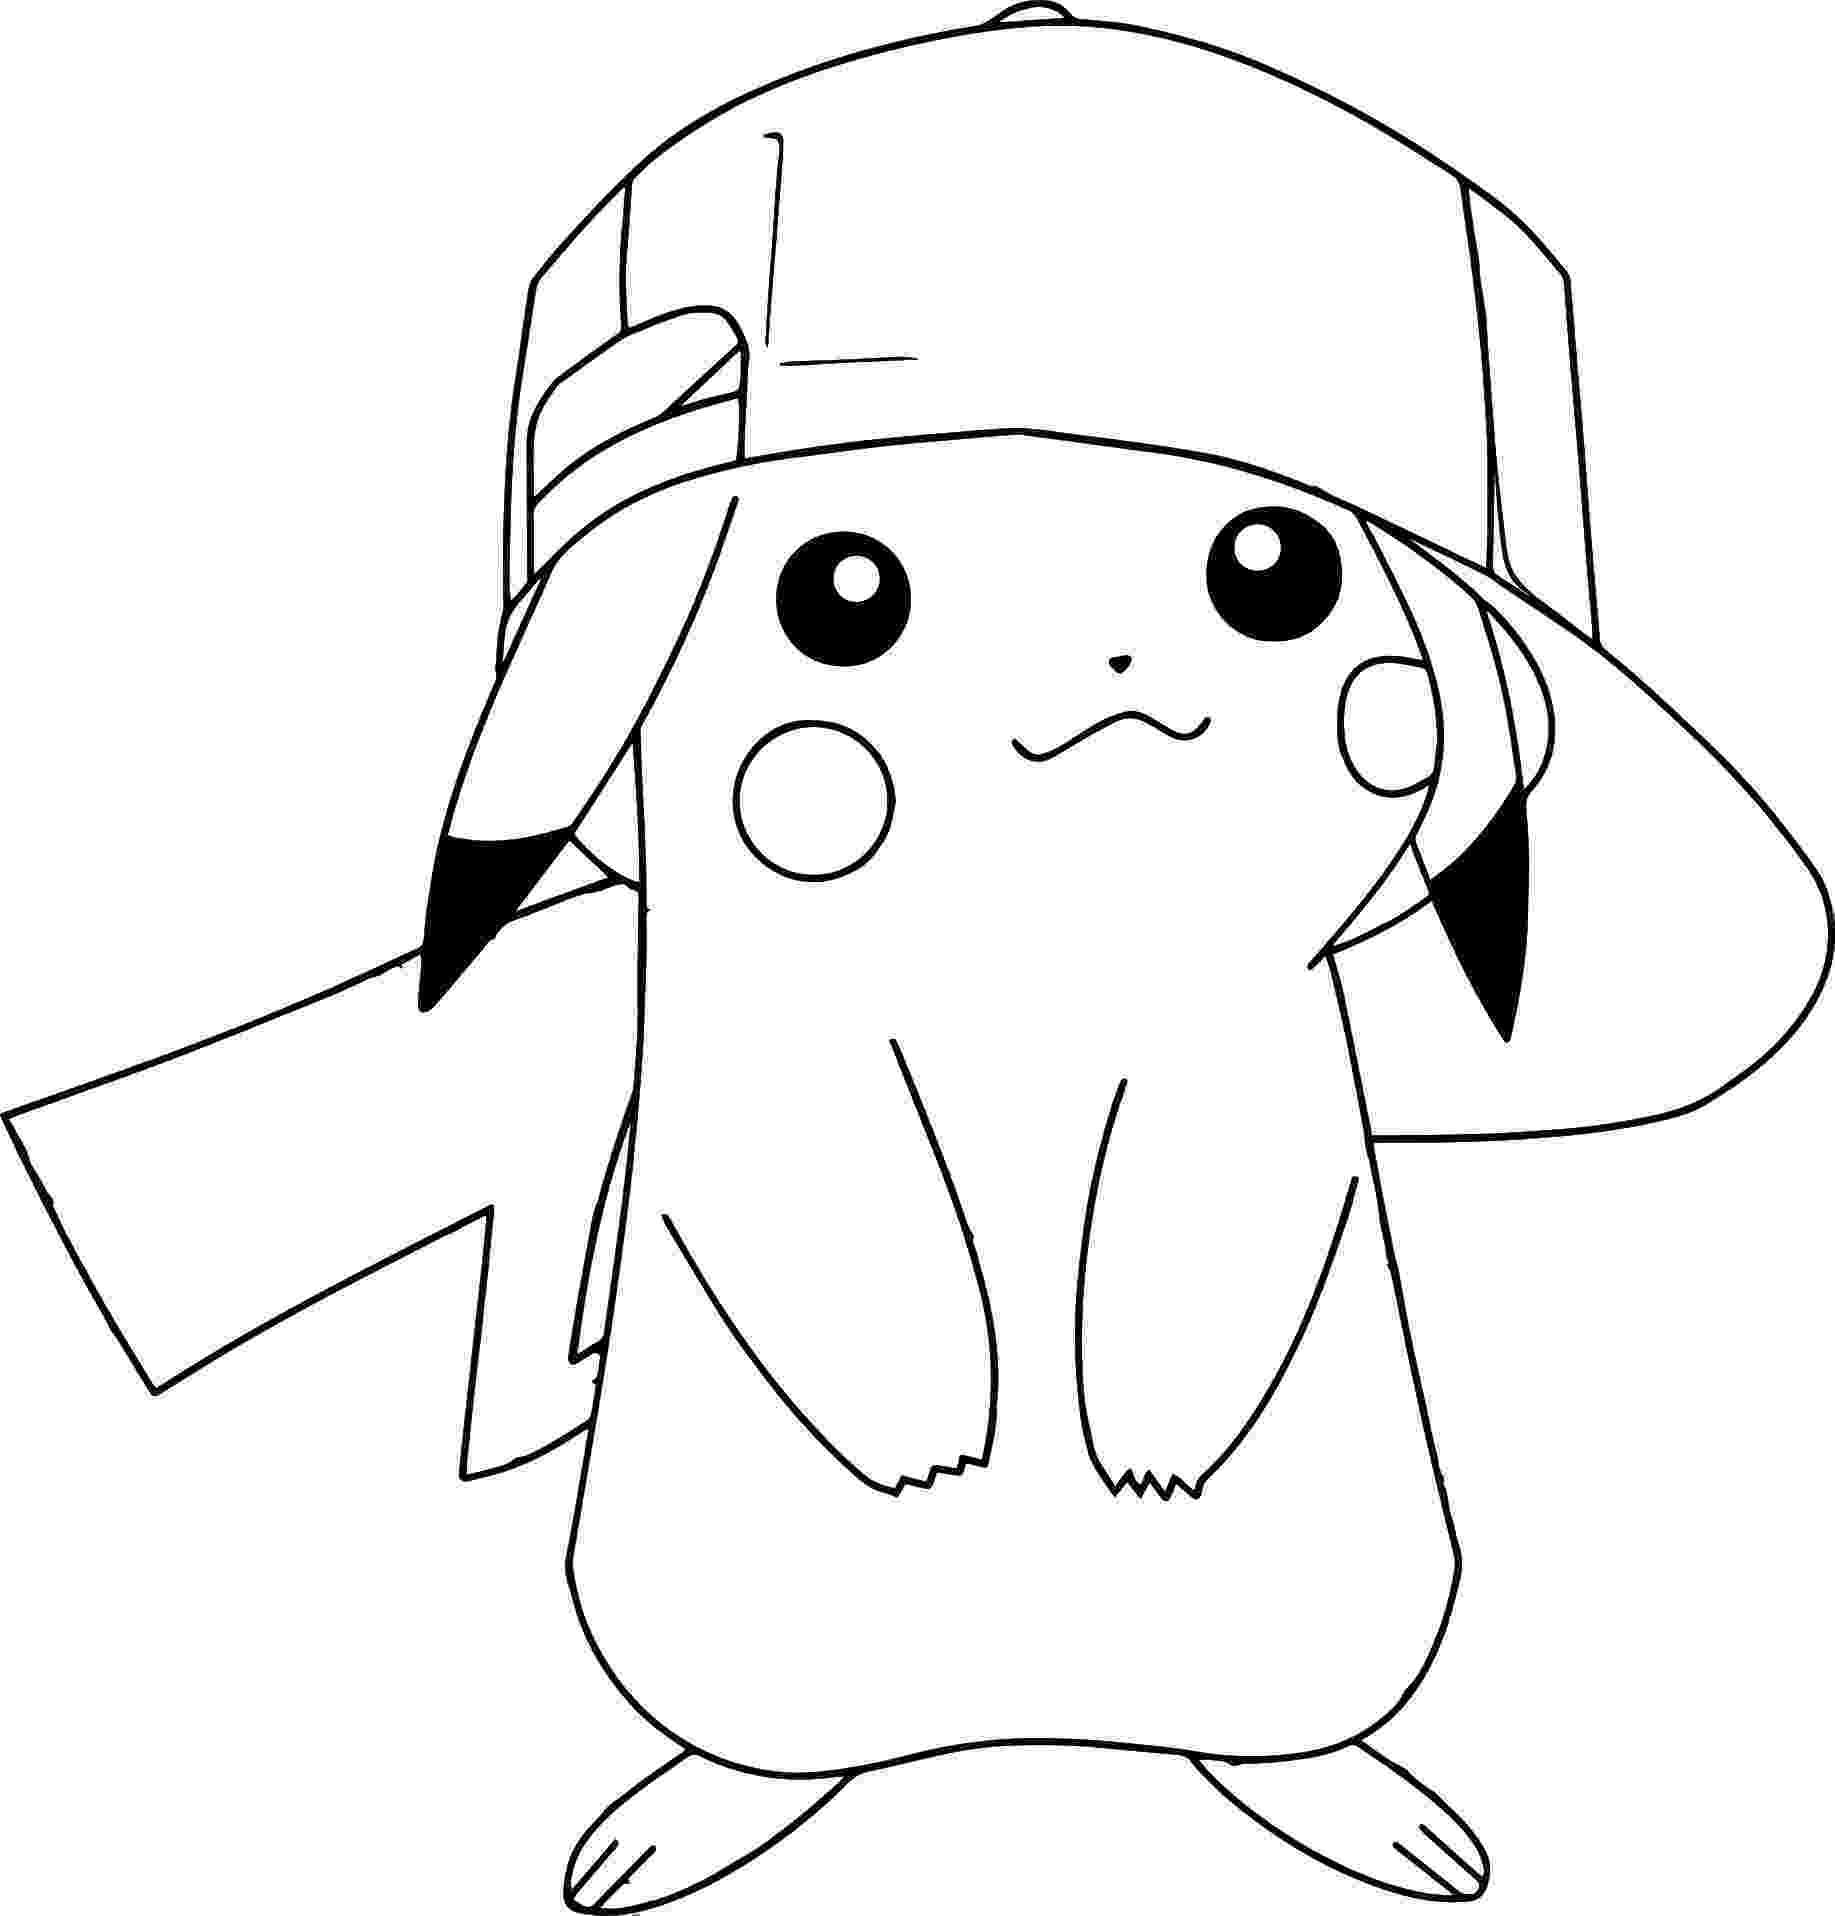 coloring pokemon perfect pokemon coloring pages lol pinterest pokemon coloring pokemon